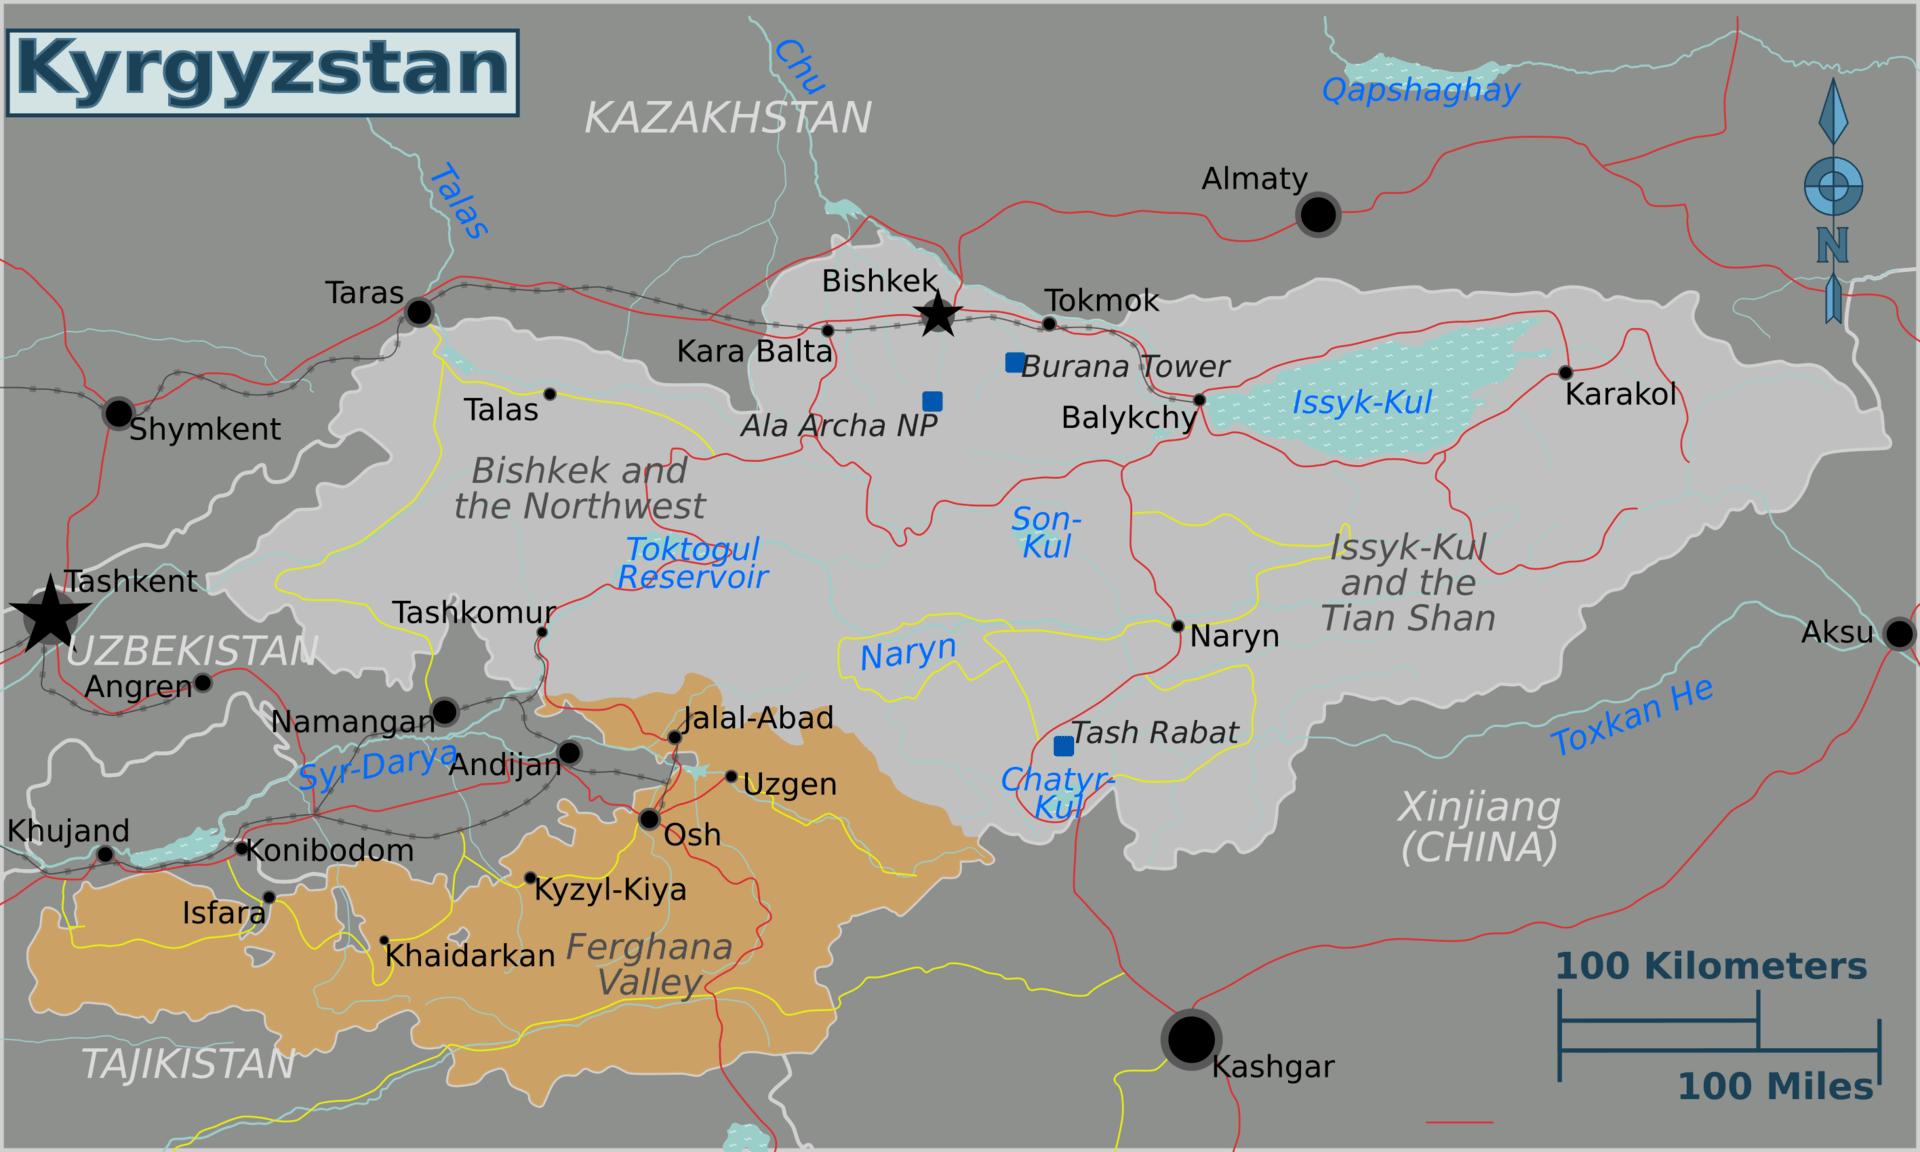 Karte des Ferghanatals